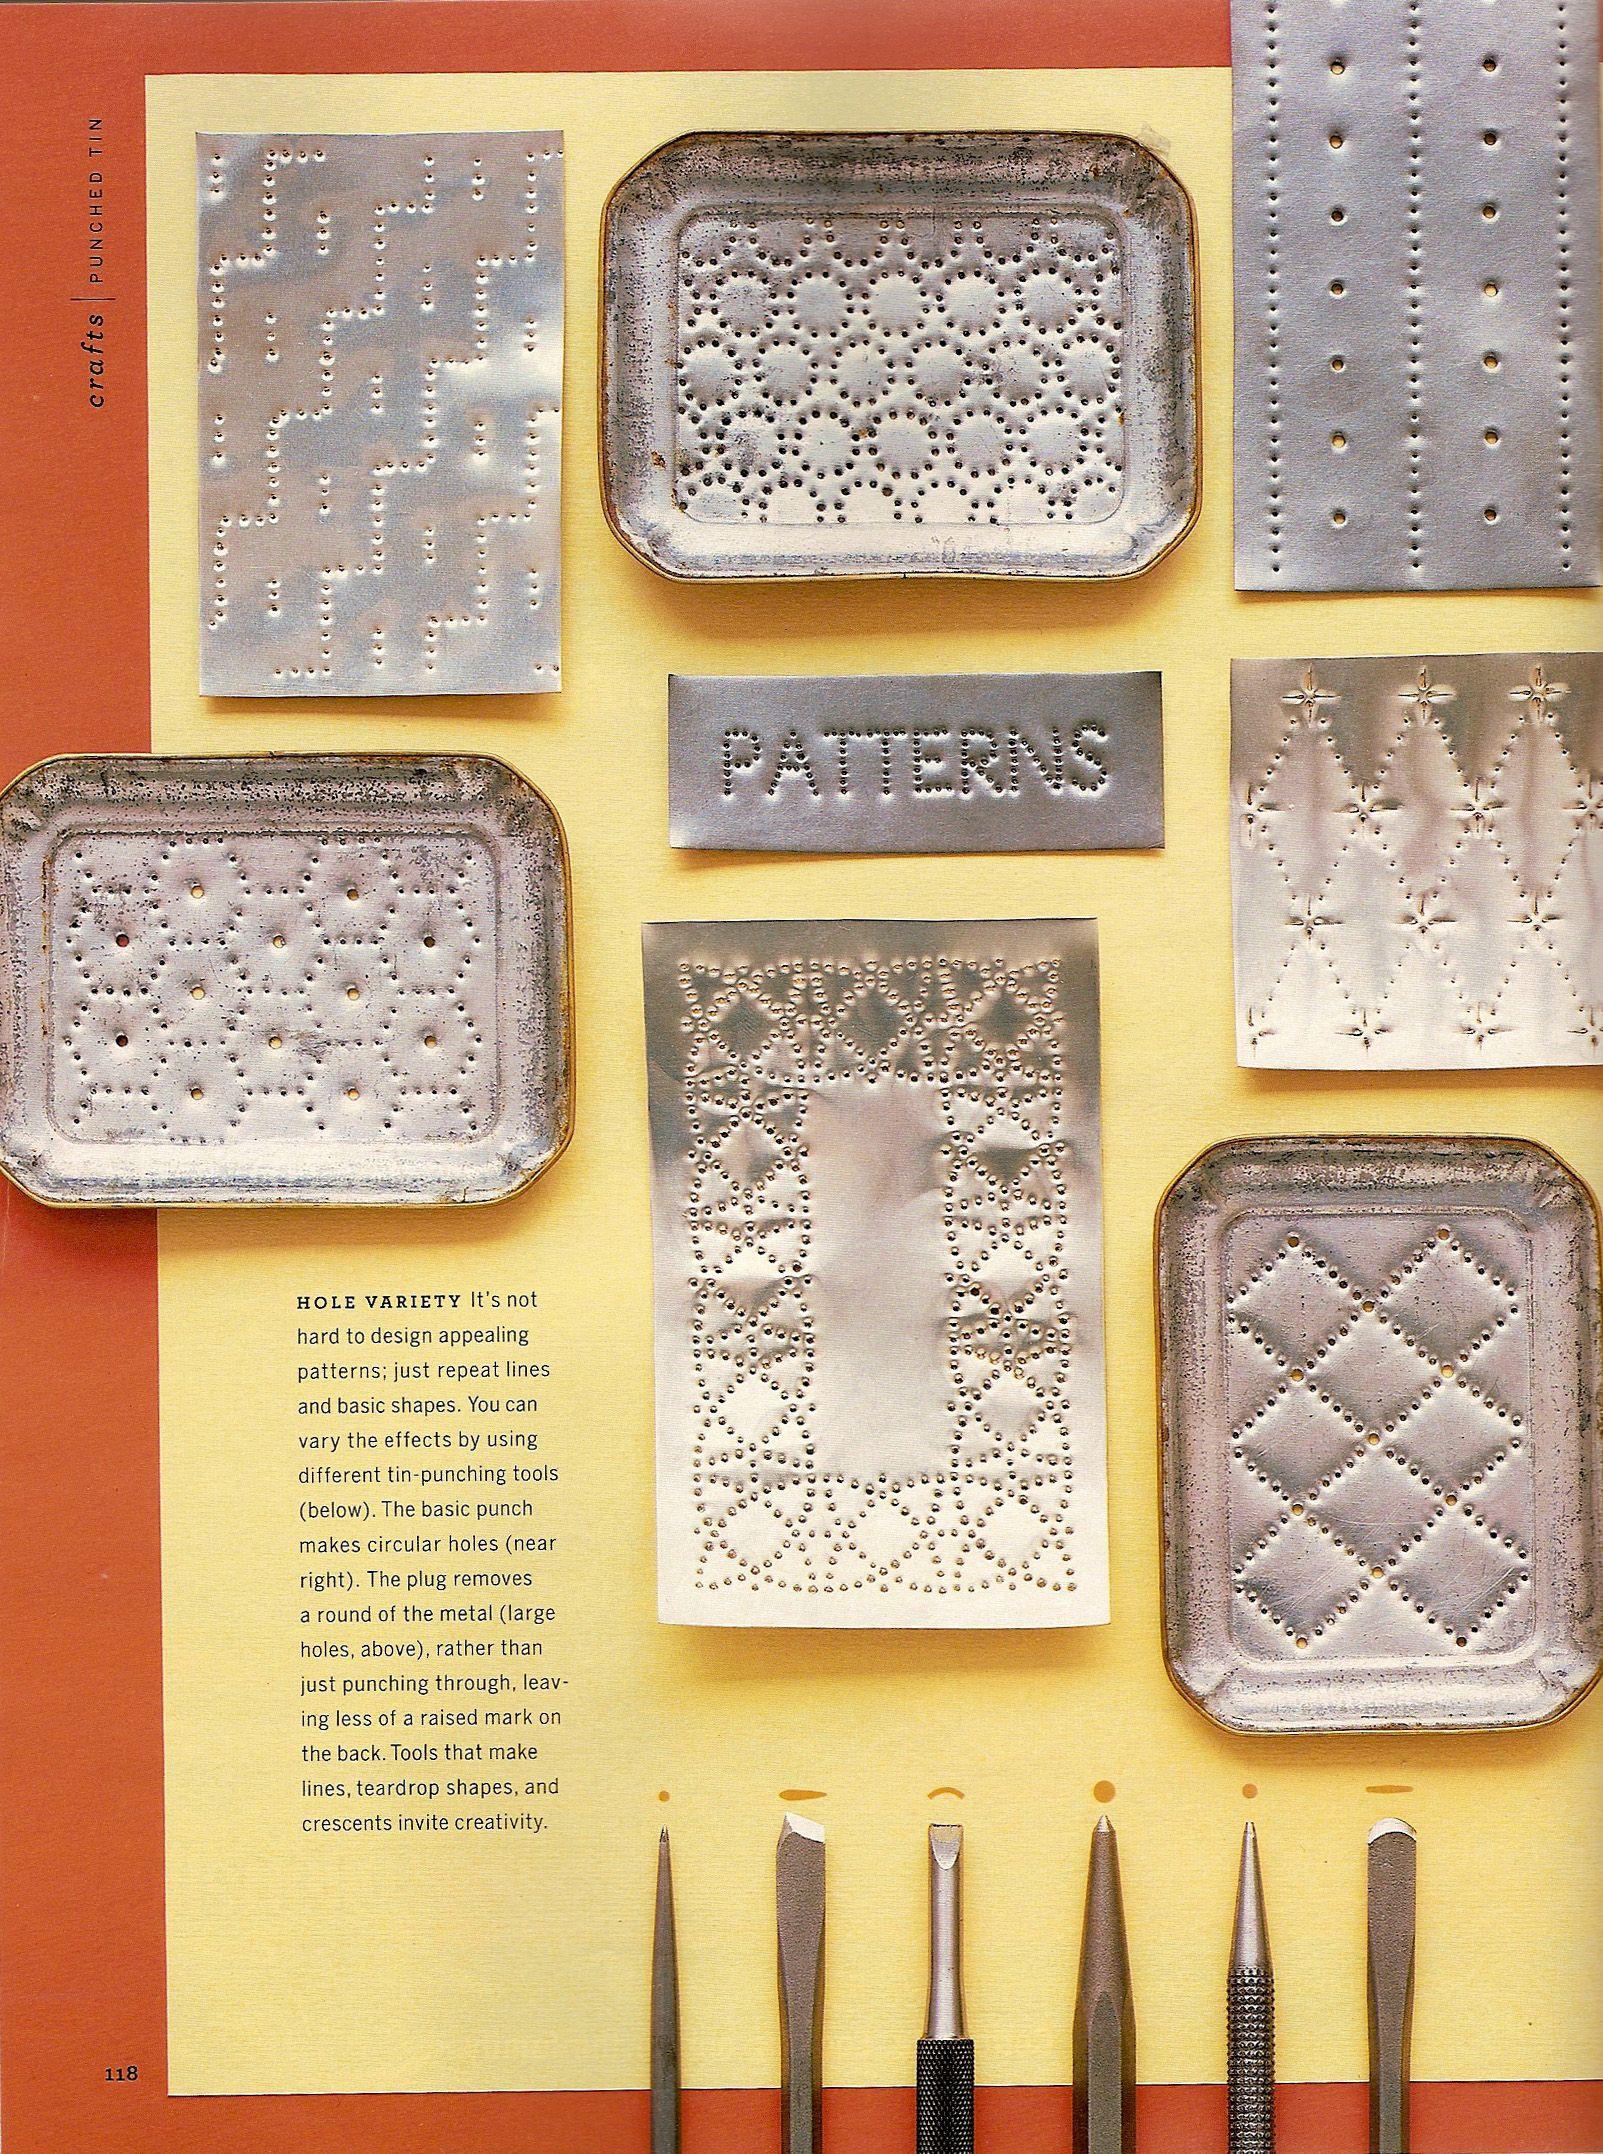 Martha Stewart Living Punched Tin Story November 2003 By Lauren Potter At Coroflot Com Aluminum Can Crafts Tin Foil Art Tin Can Art